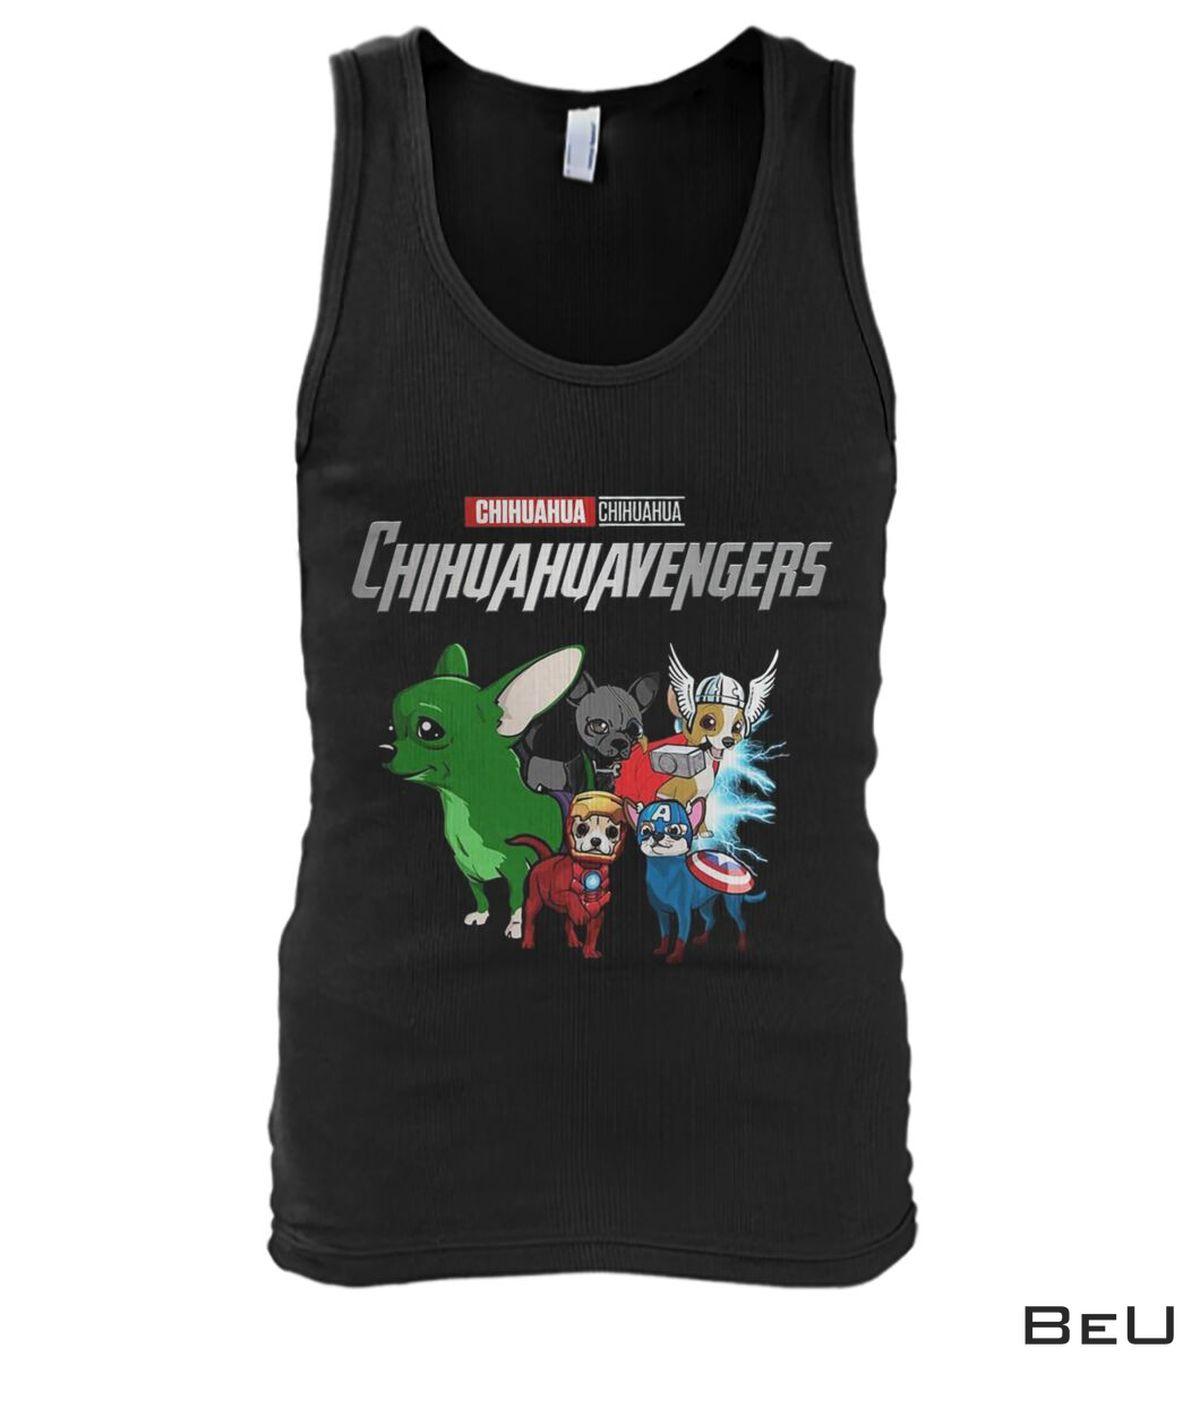 Chihuahua Chihuahuavengers Avengers Shirtx